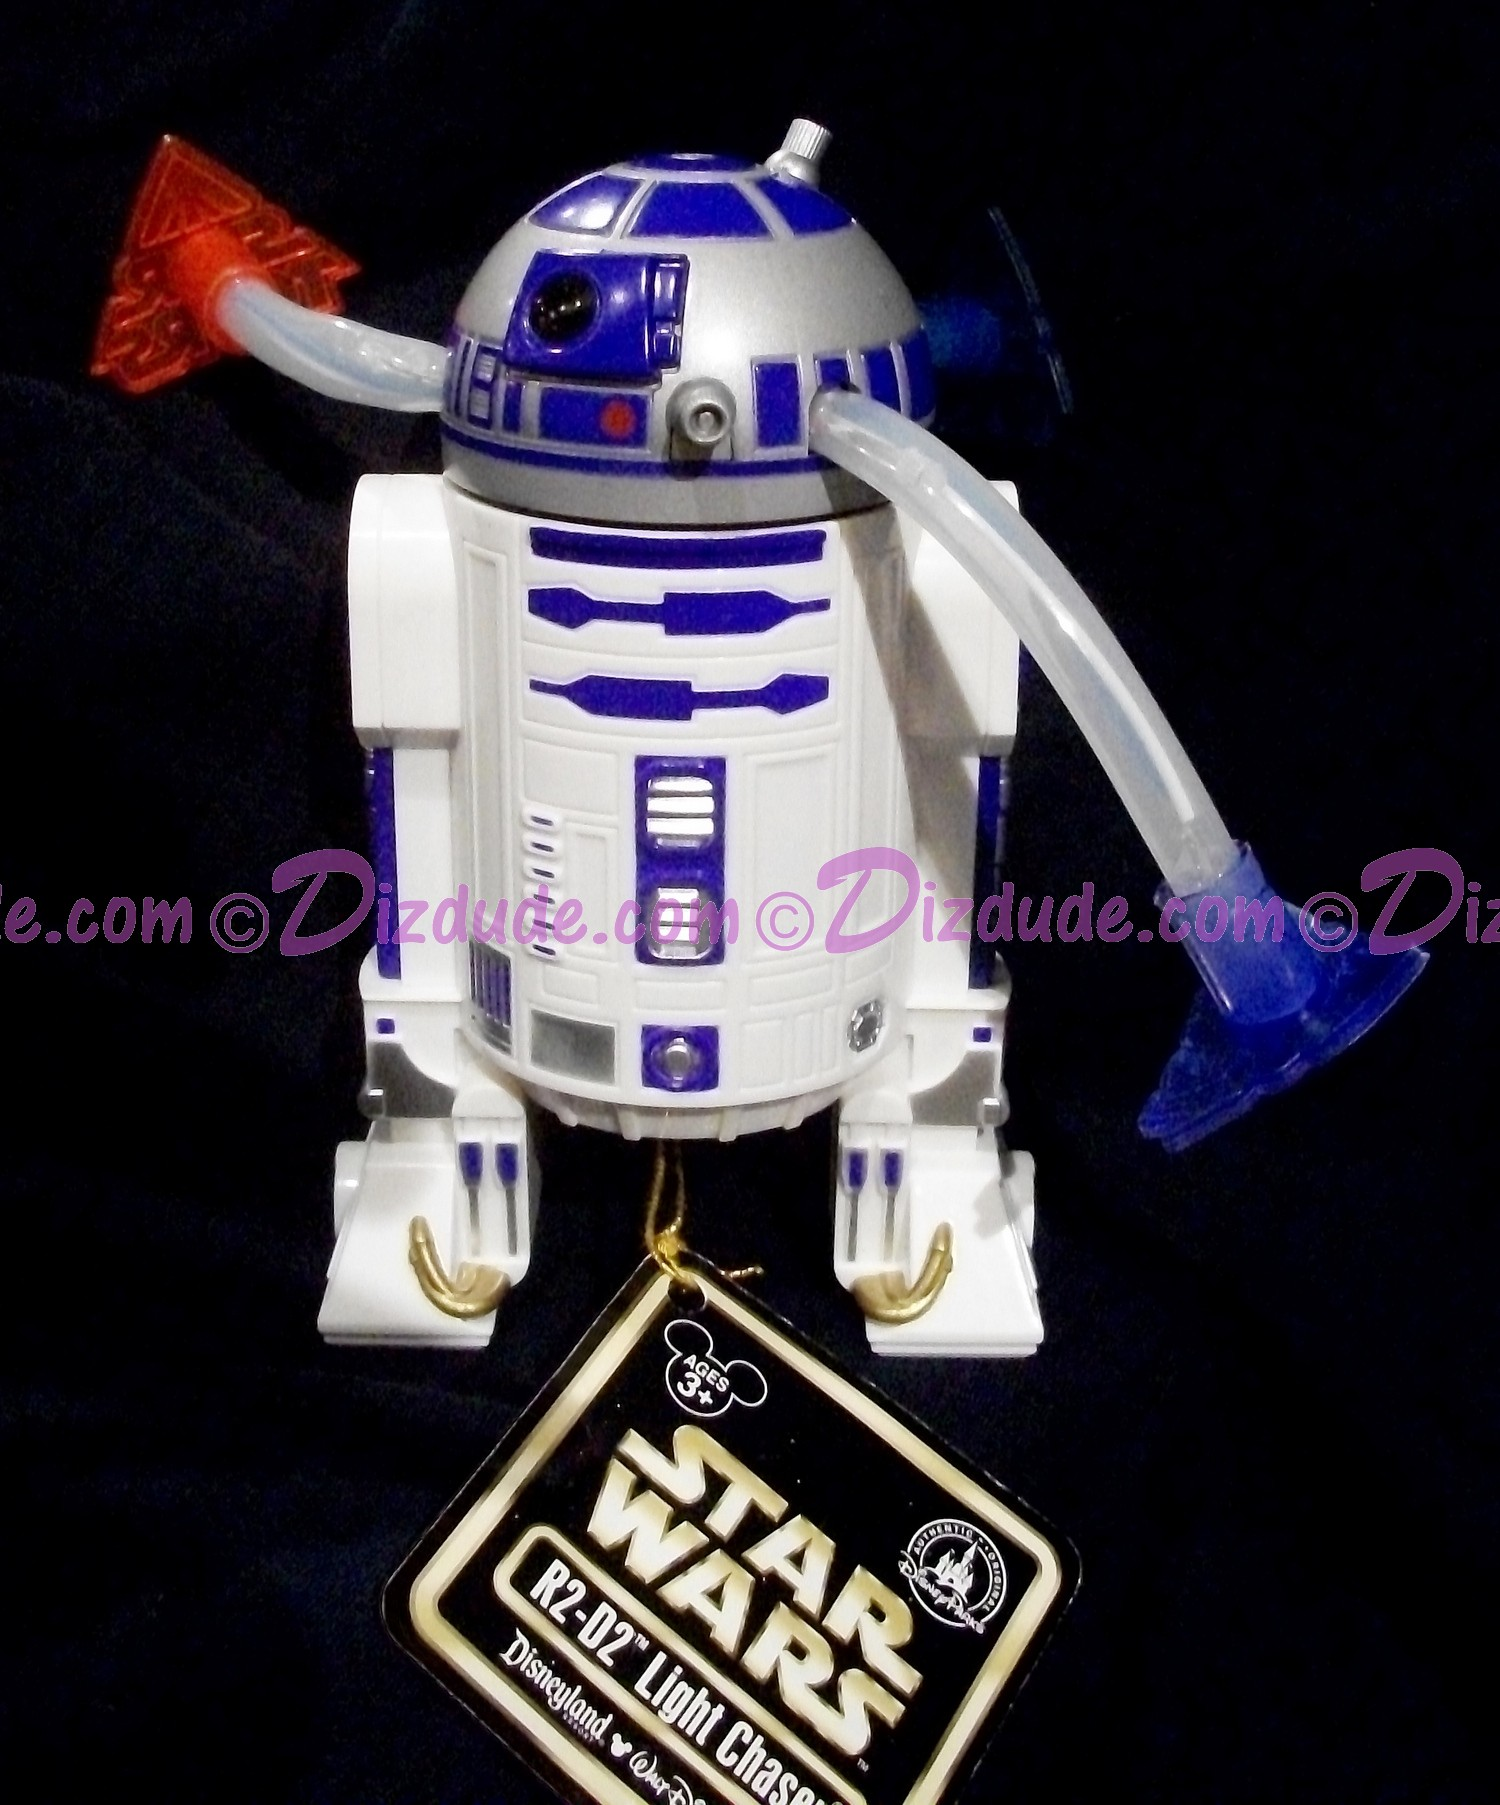 Disney Star Wars ~ Star Tours R2-D2 Light Chaser © Dizdude.com